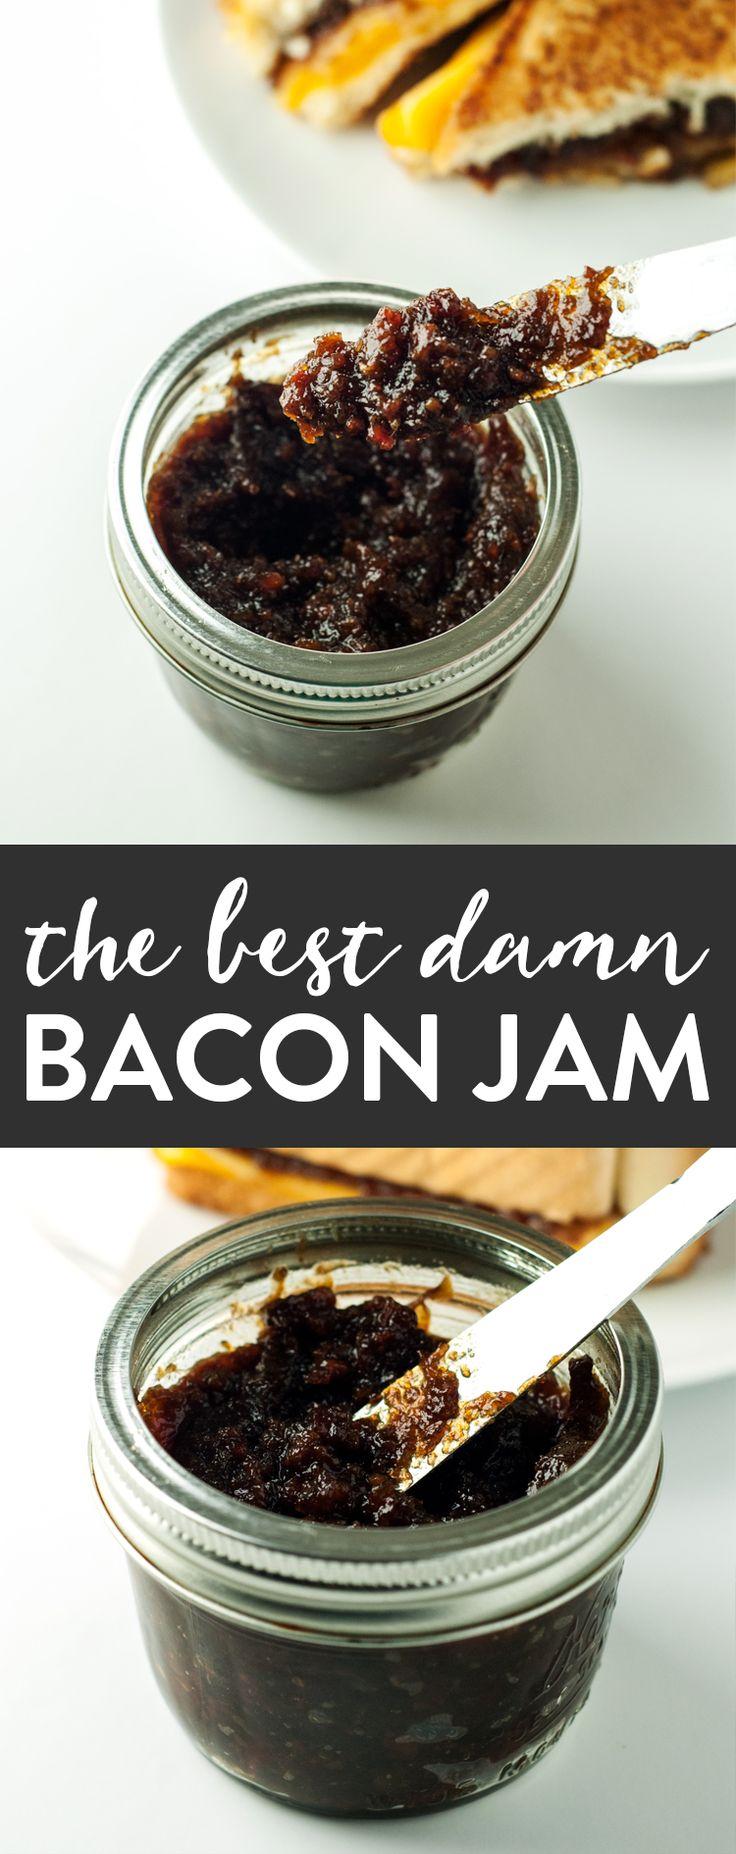 The Best Damn Bacon Jam Recipe | asimplepantry.com